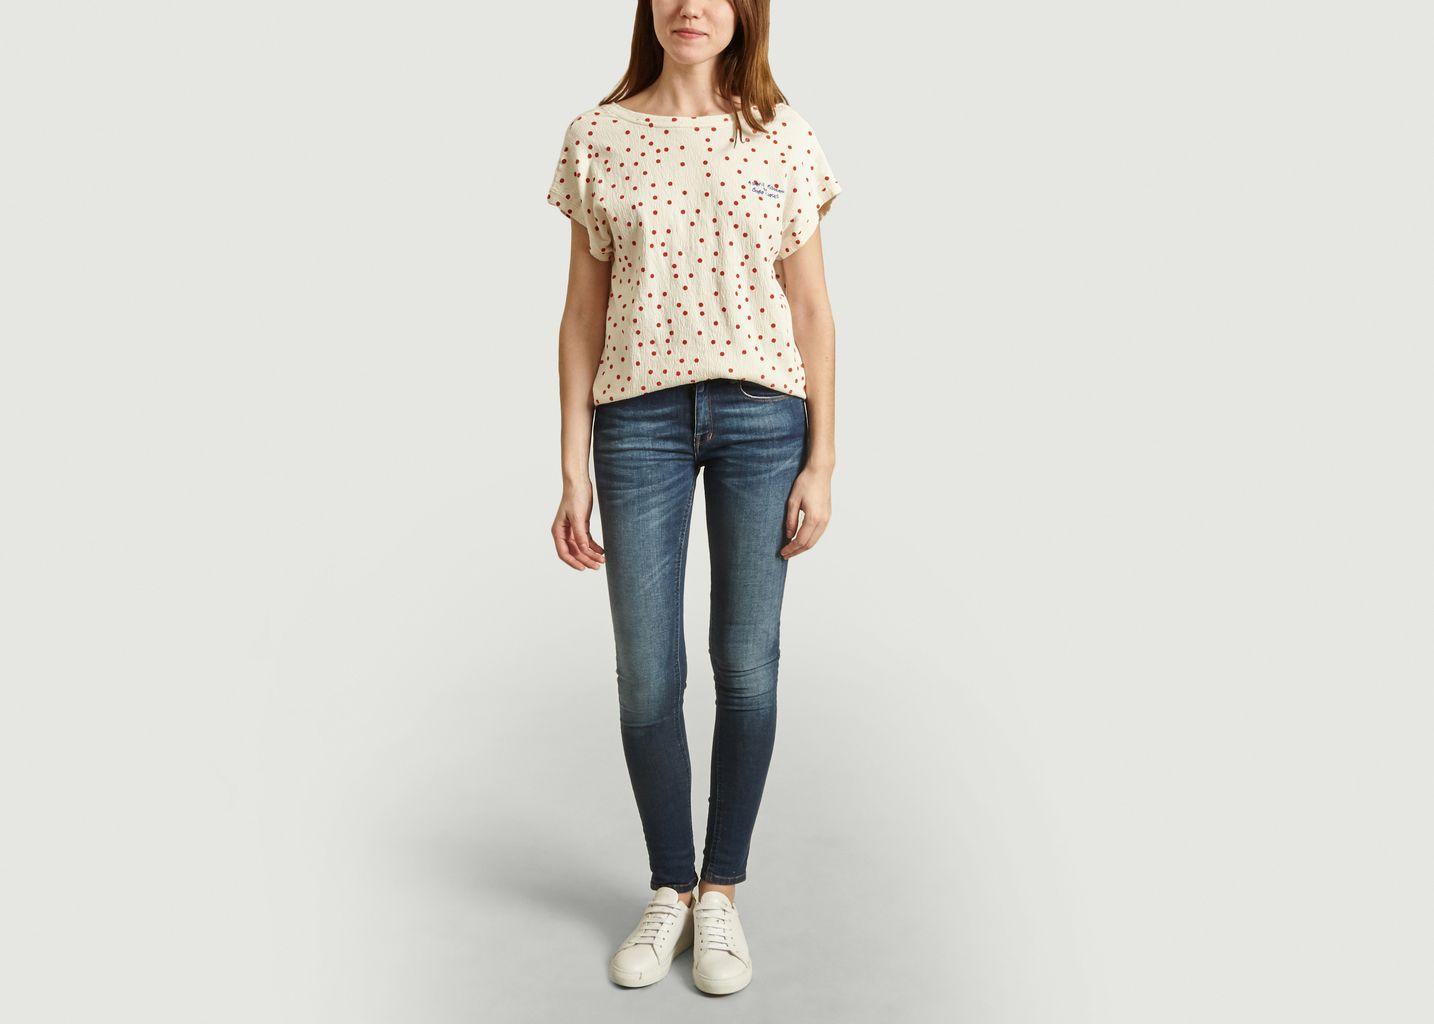 T-Shirt Imprimé Pois - Bobo Choses